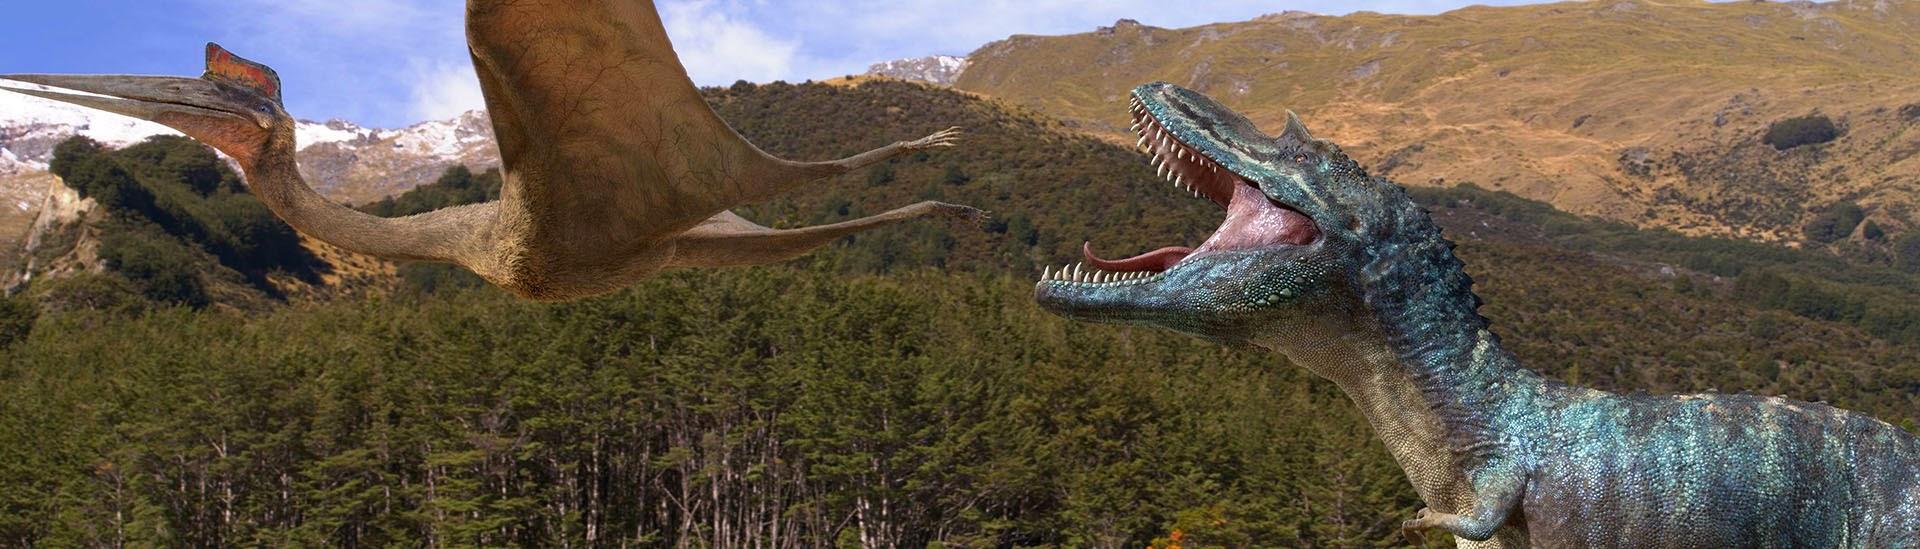 Baner filmu 'Wędrówki Z Dinozaurami'